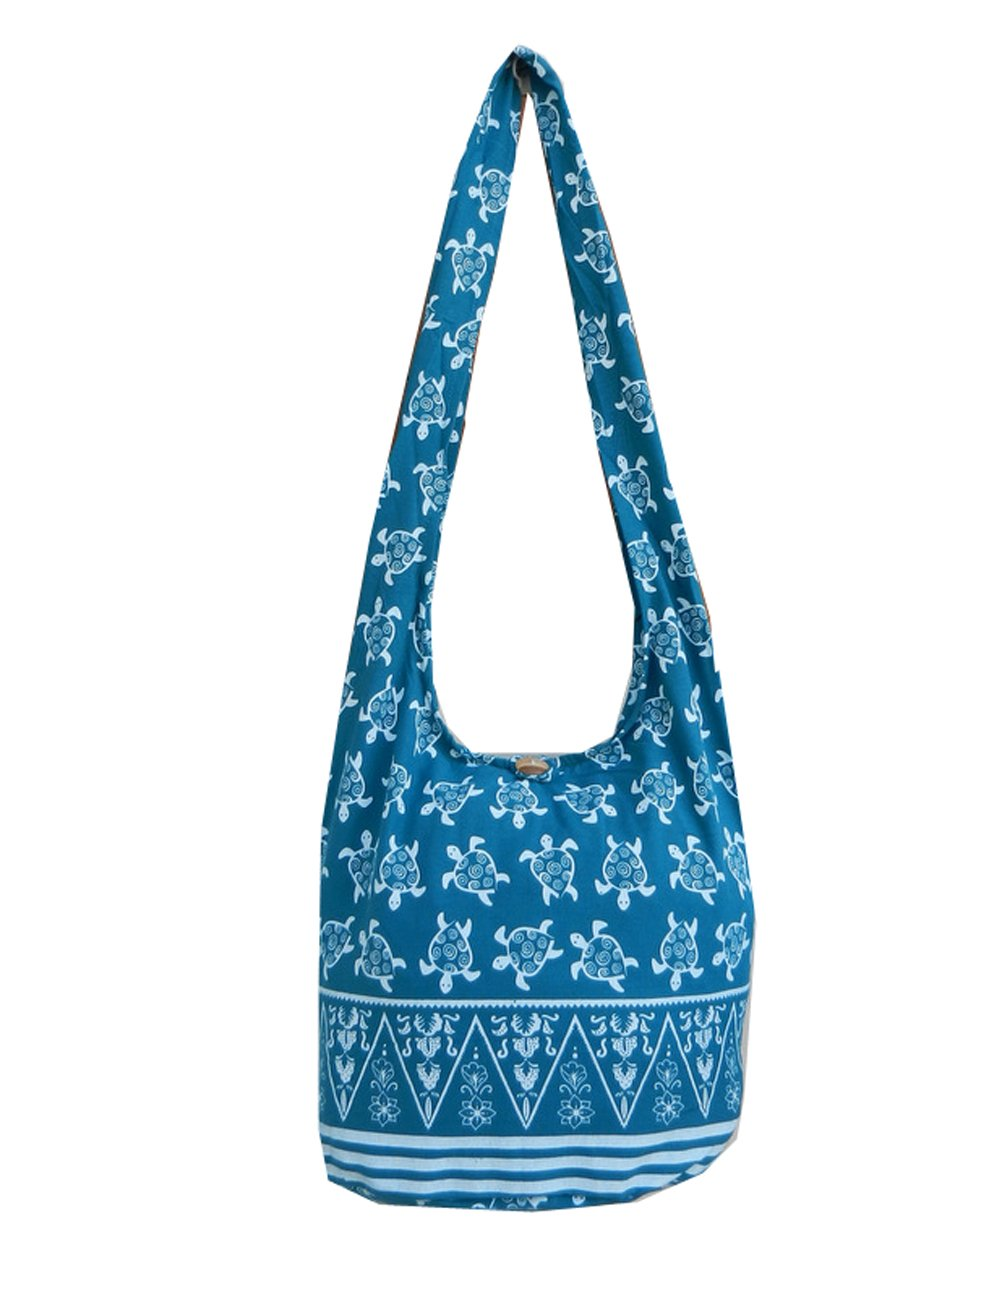 BTP! Turtle Sling Crossbody Shoulder Bag Purse Hippie Hobo Thai Cotton Gypsy Bohemian Large (Teal OW8)